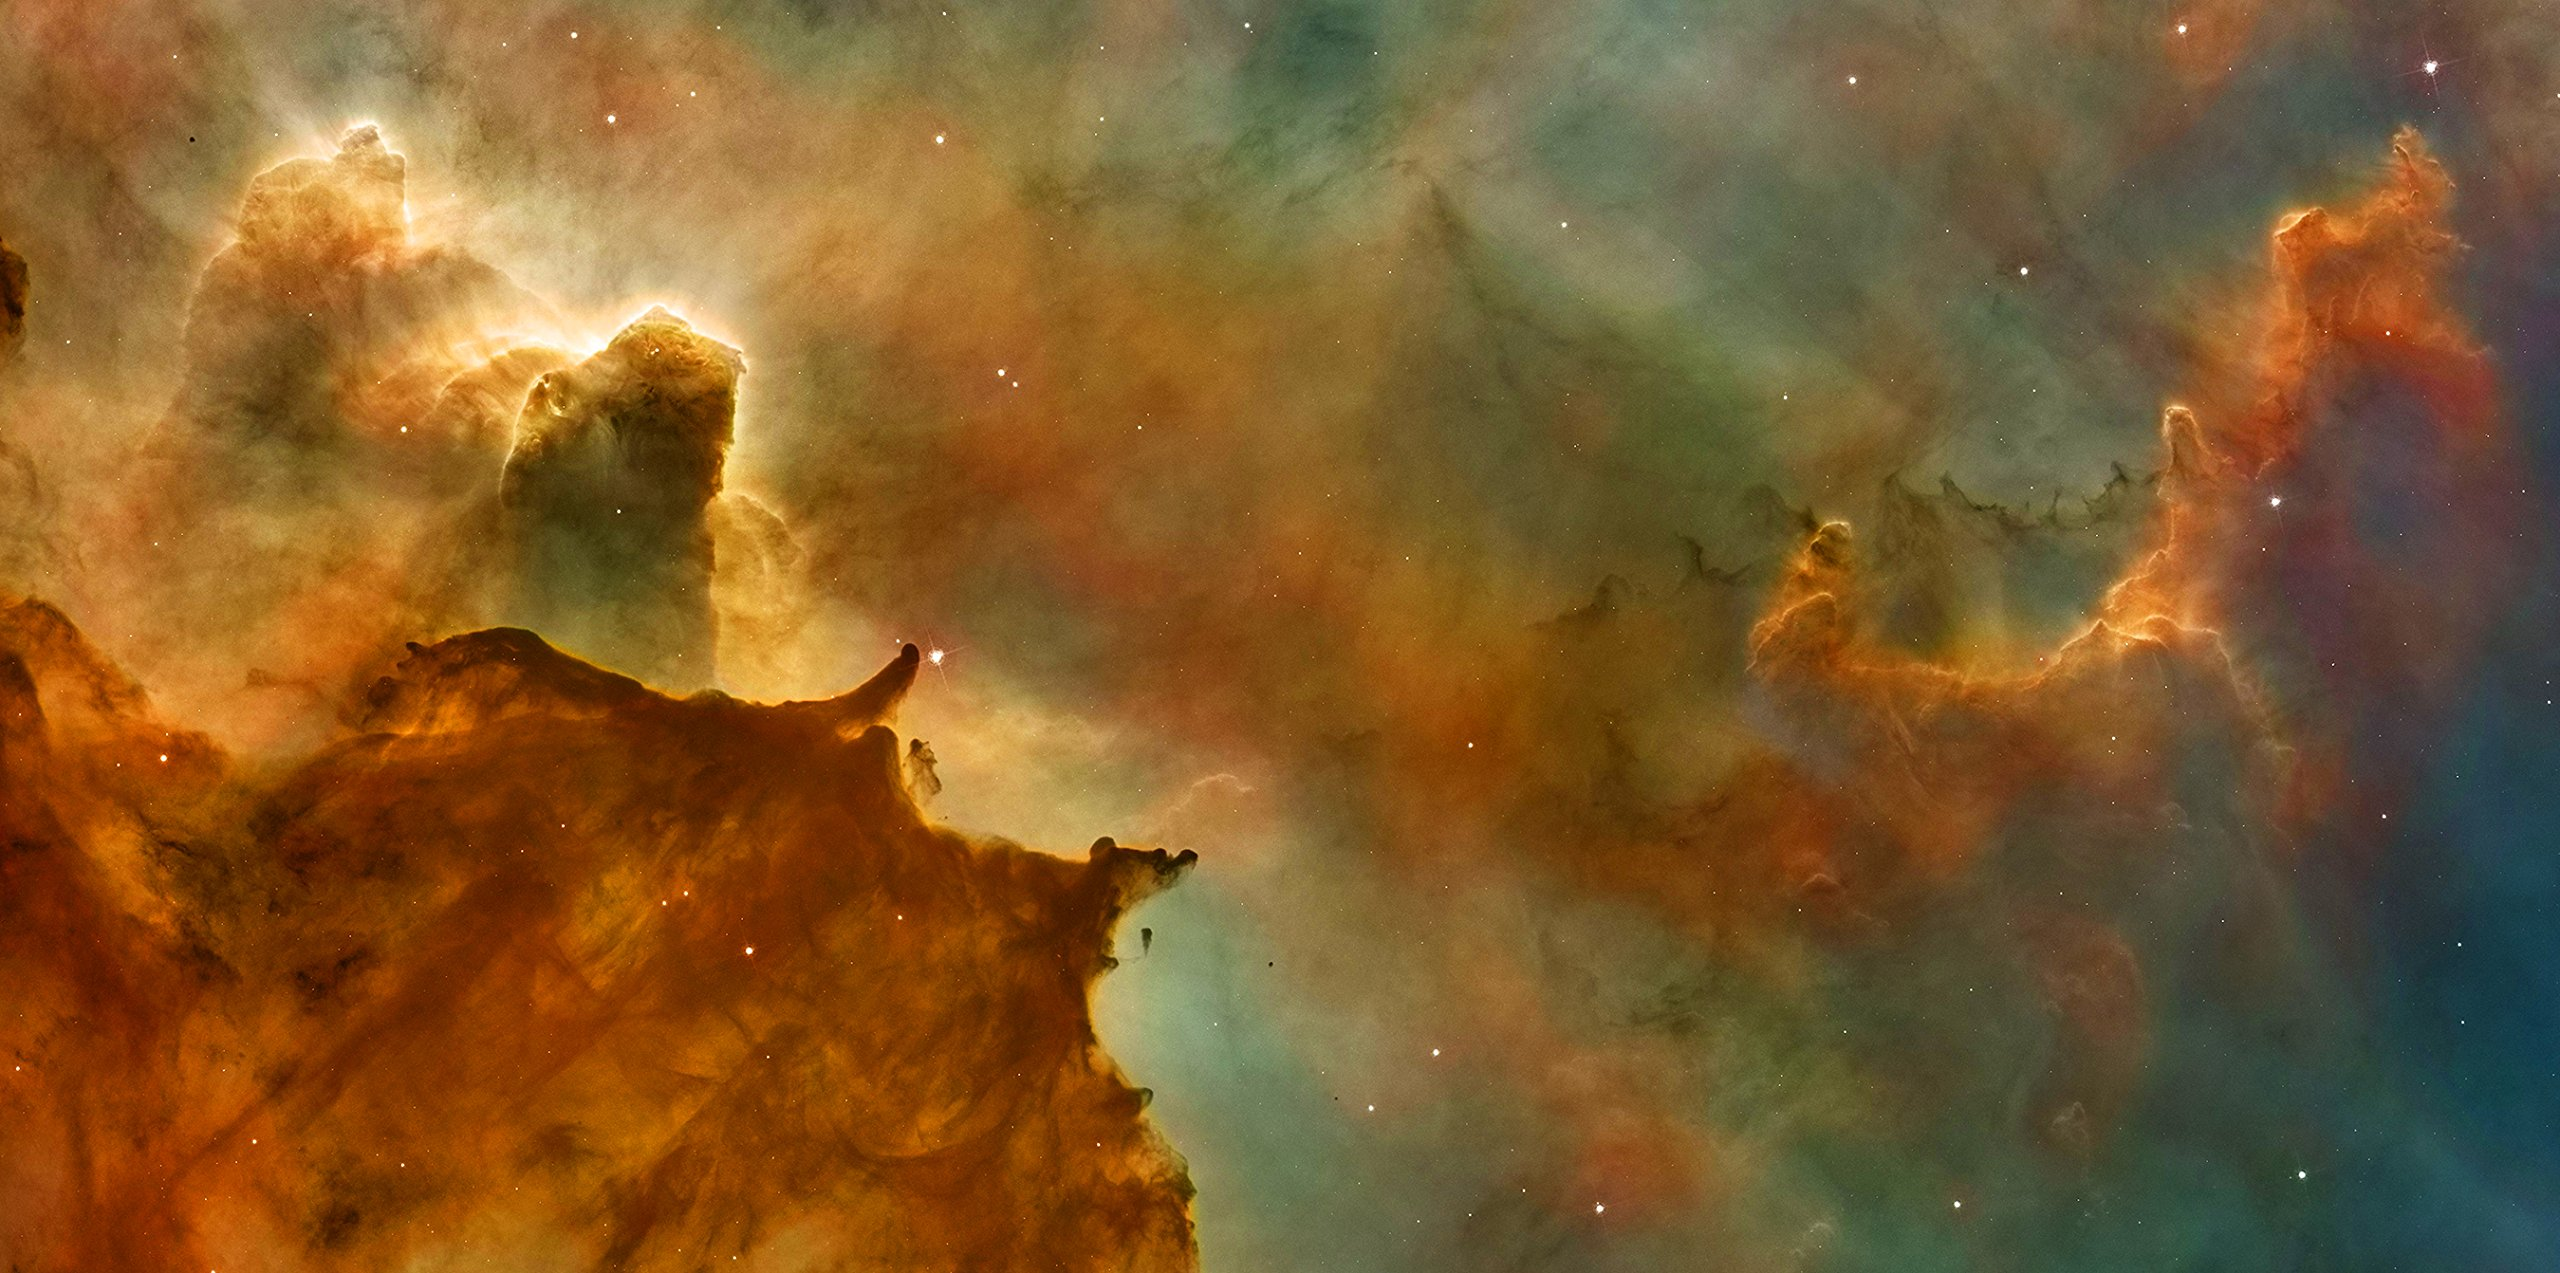 Stellar Nebula - 2ft x 4ft Drop Ceiling Fluorescent Decorative Ceiling Light Cover Skylight Film